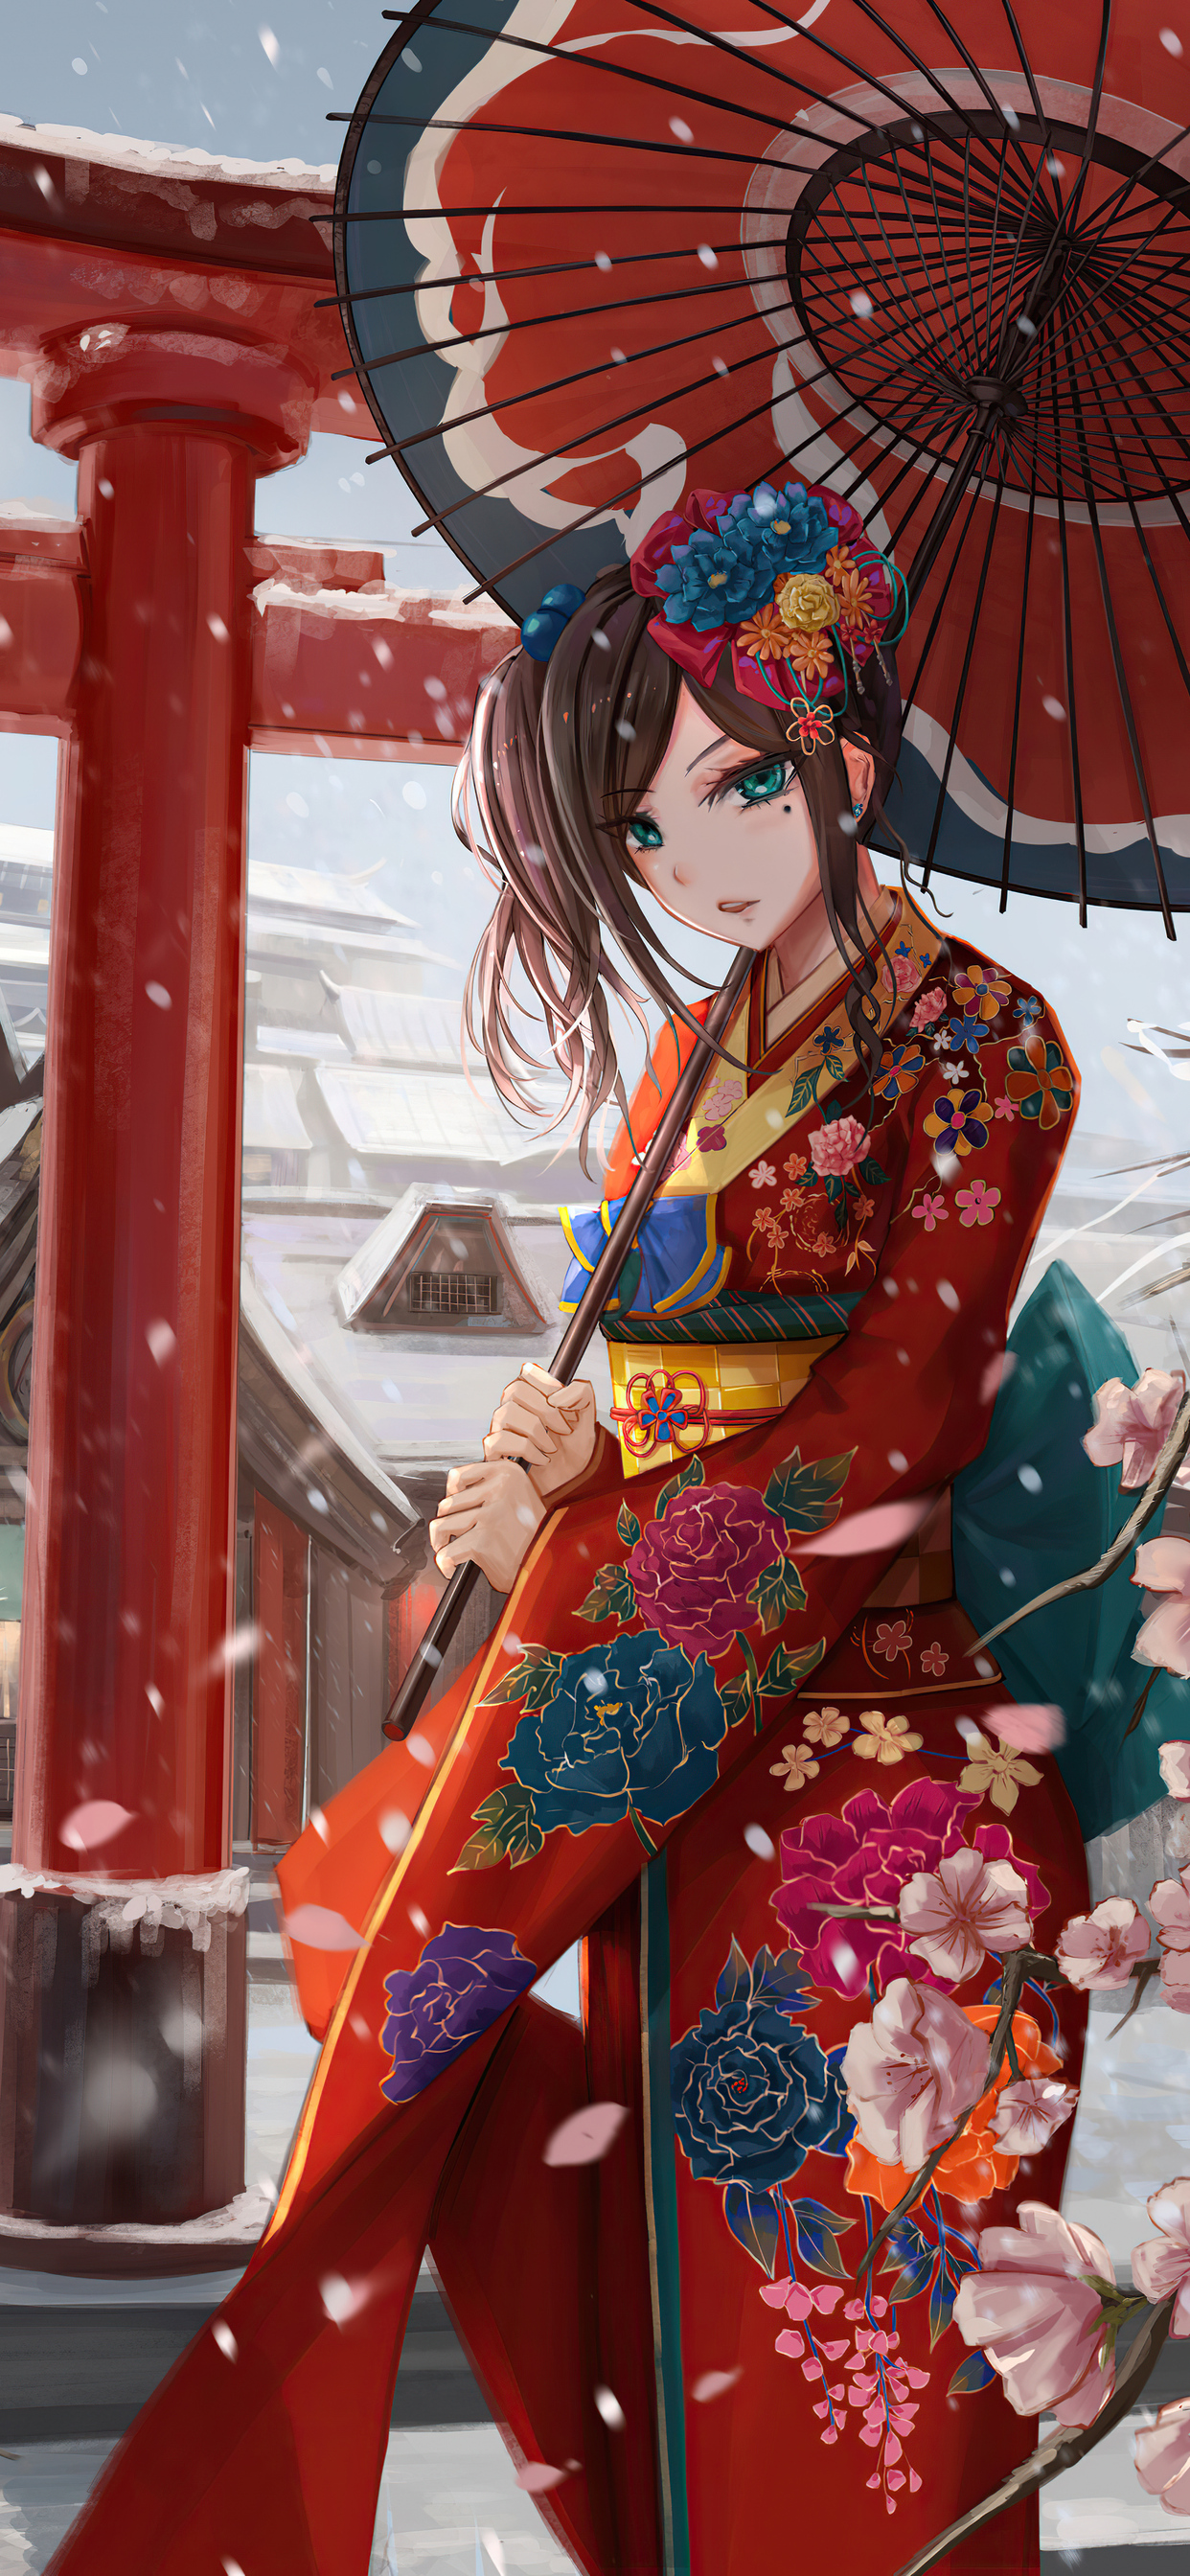 ancient-asian-girl-with-umbrella-4k-lq.jpg